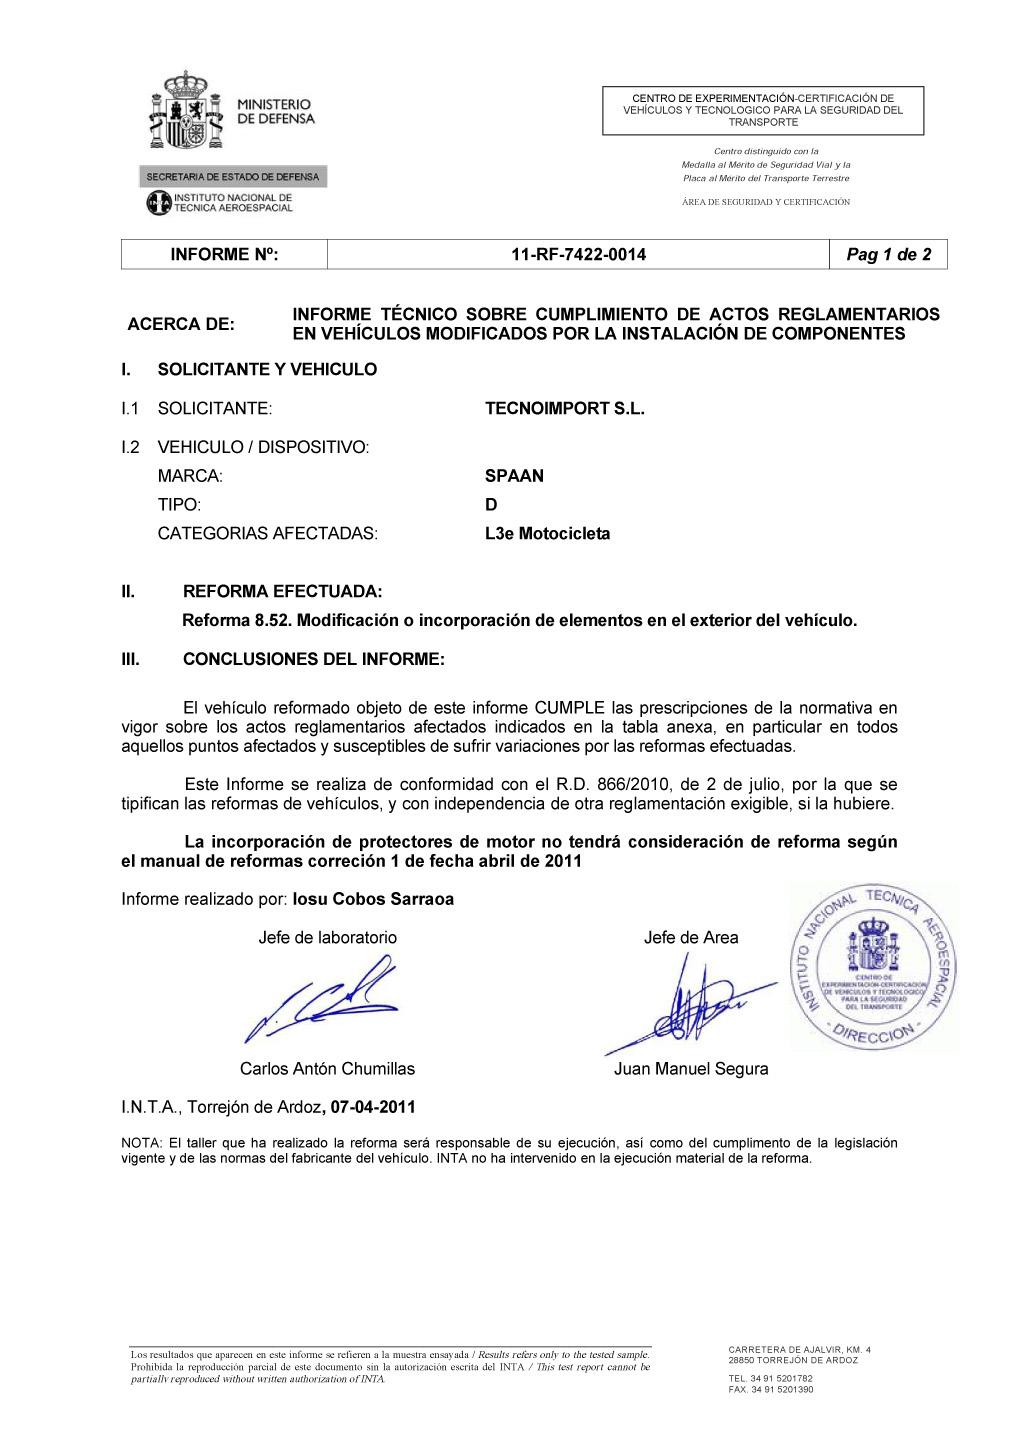 Сертификат INTA на дуги безопасностиSPAAN для мотоциклов